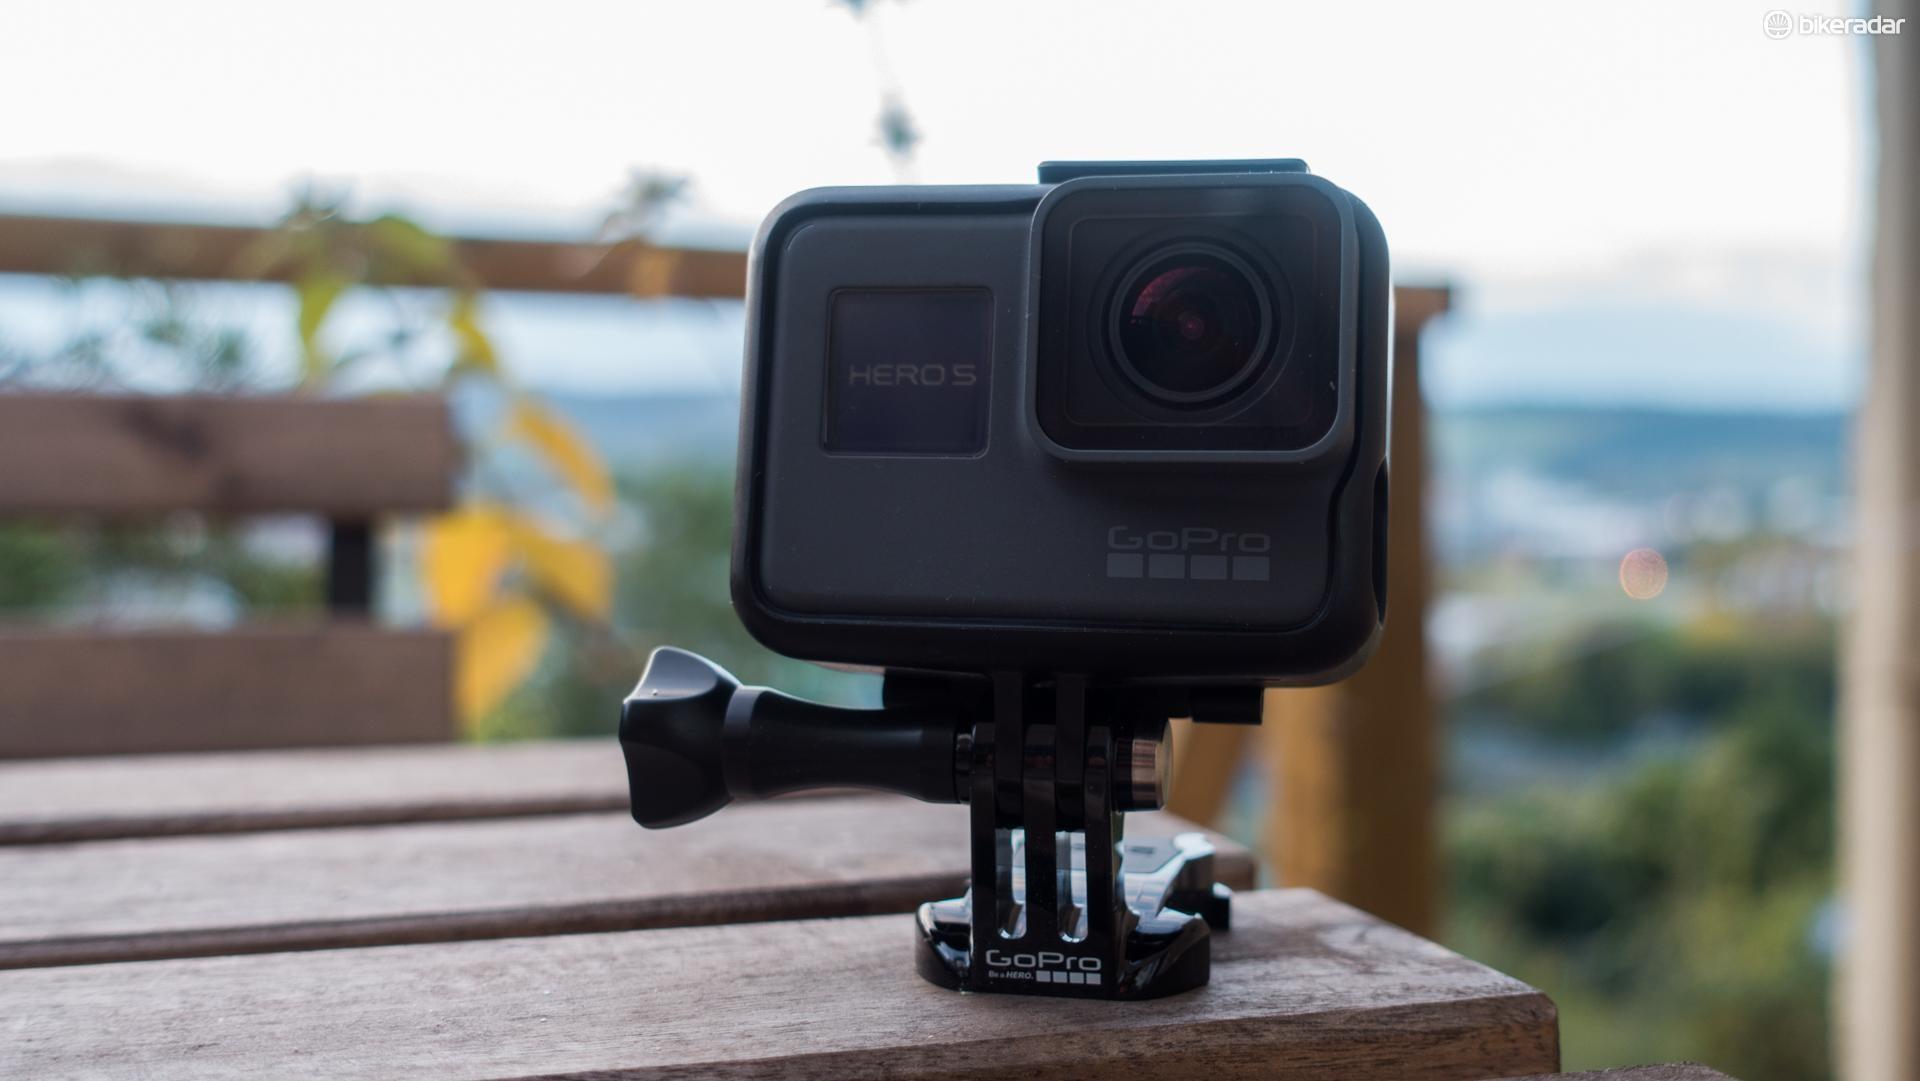 GoPro's range topping HERO5 Black